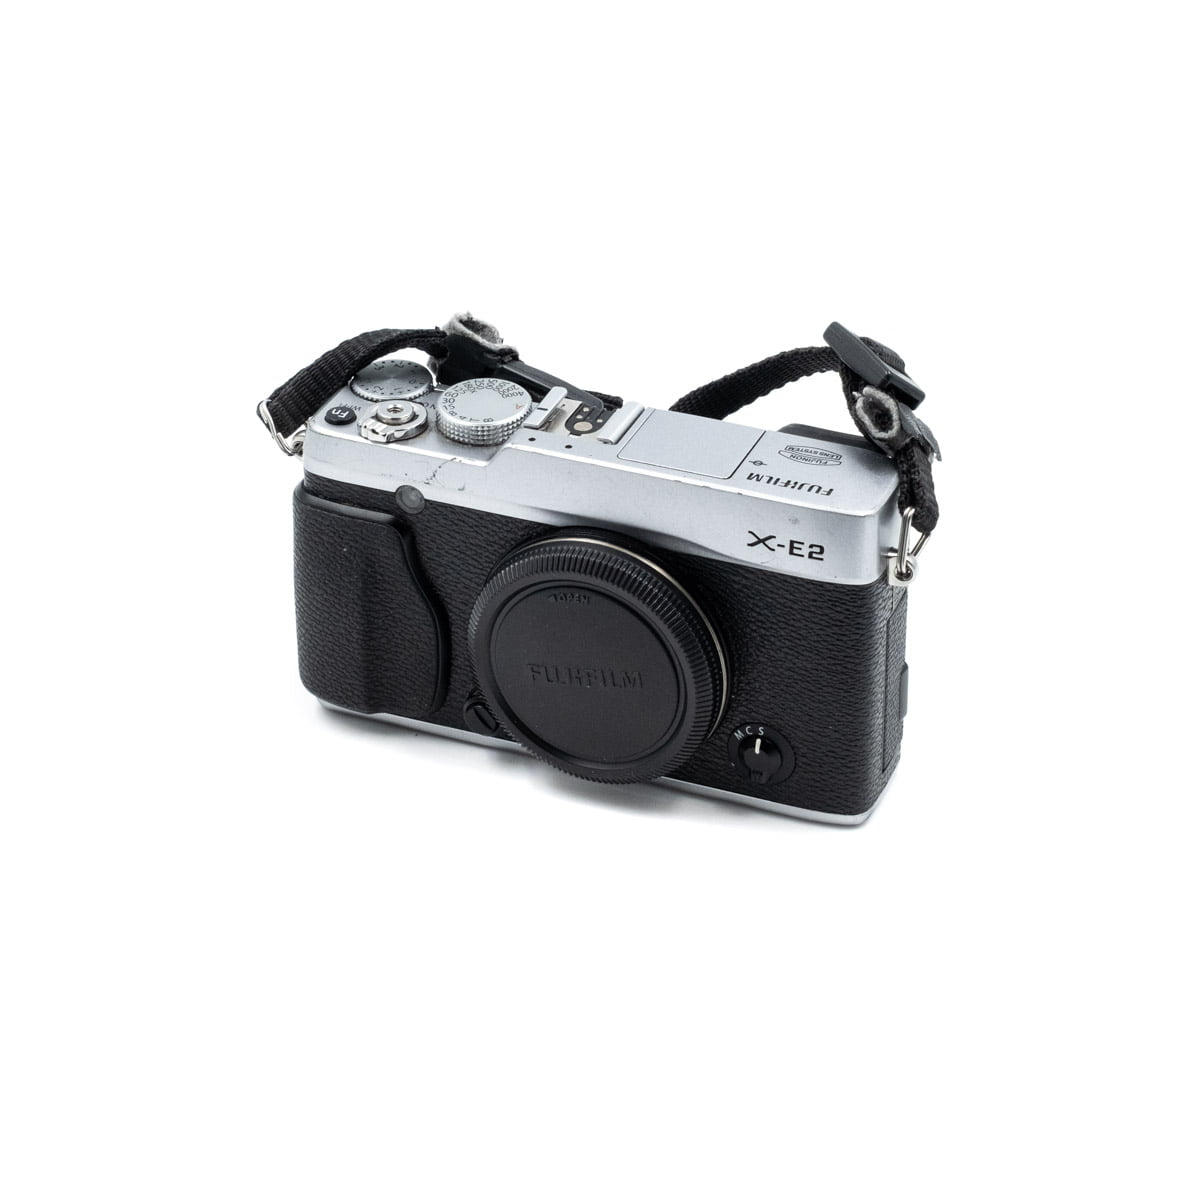 Fujifilm X-E2 – Käytetty